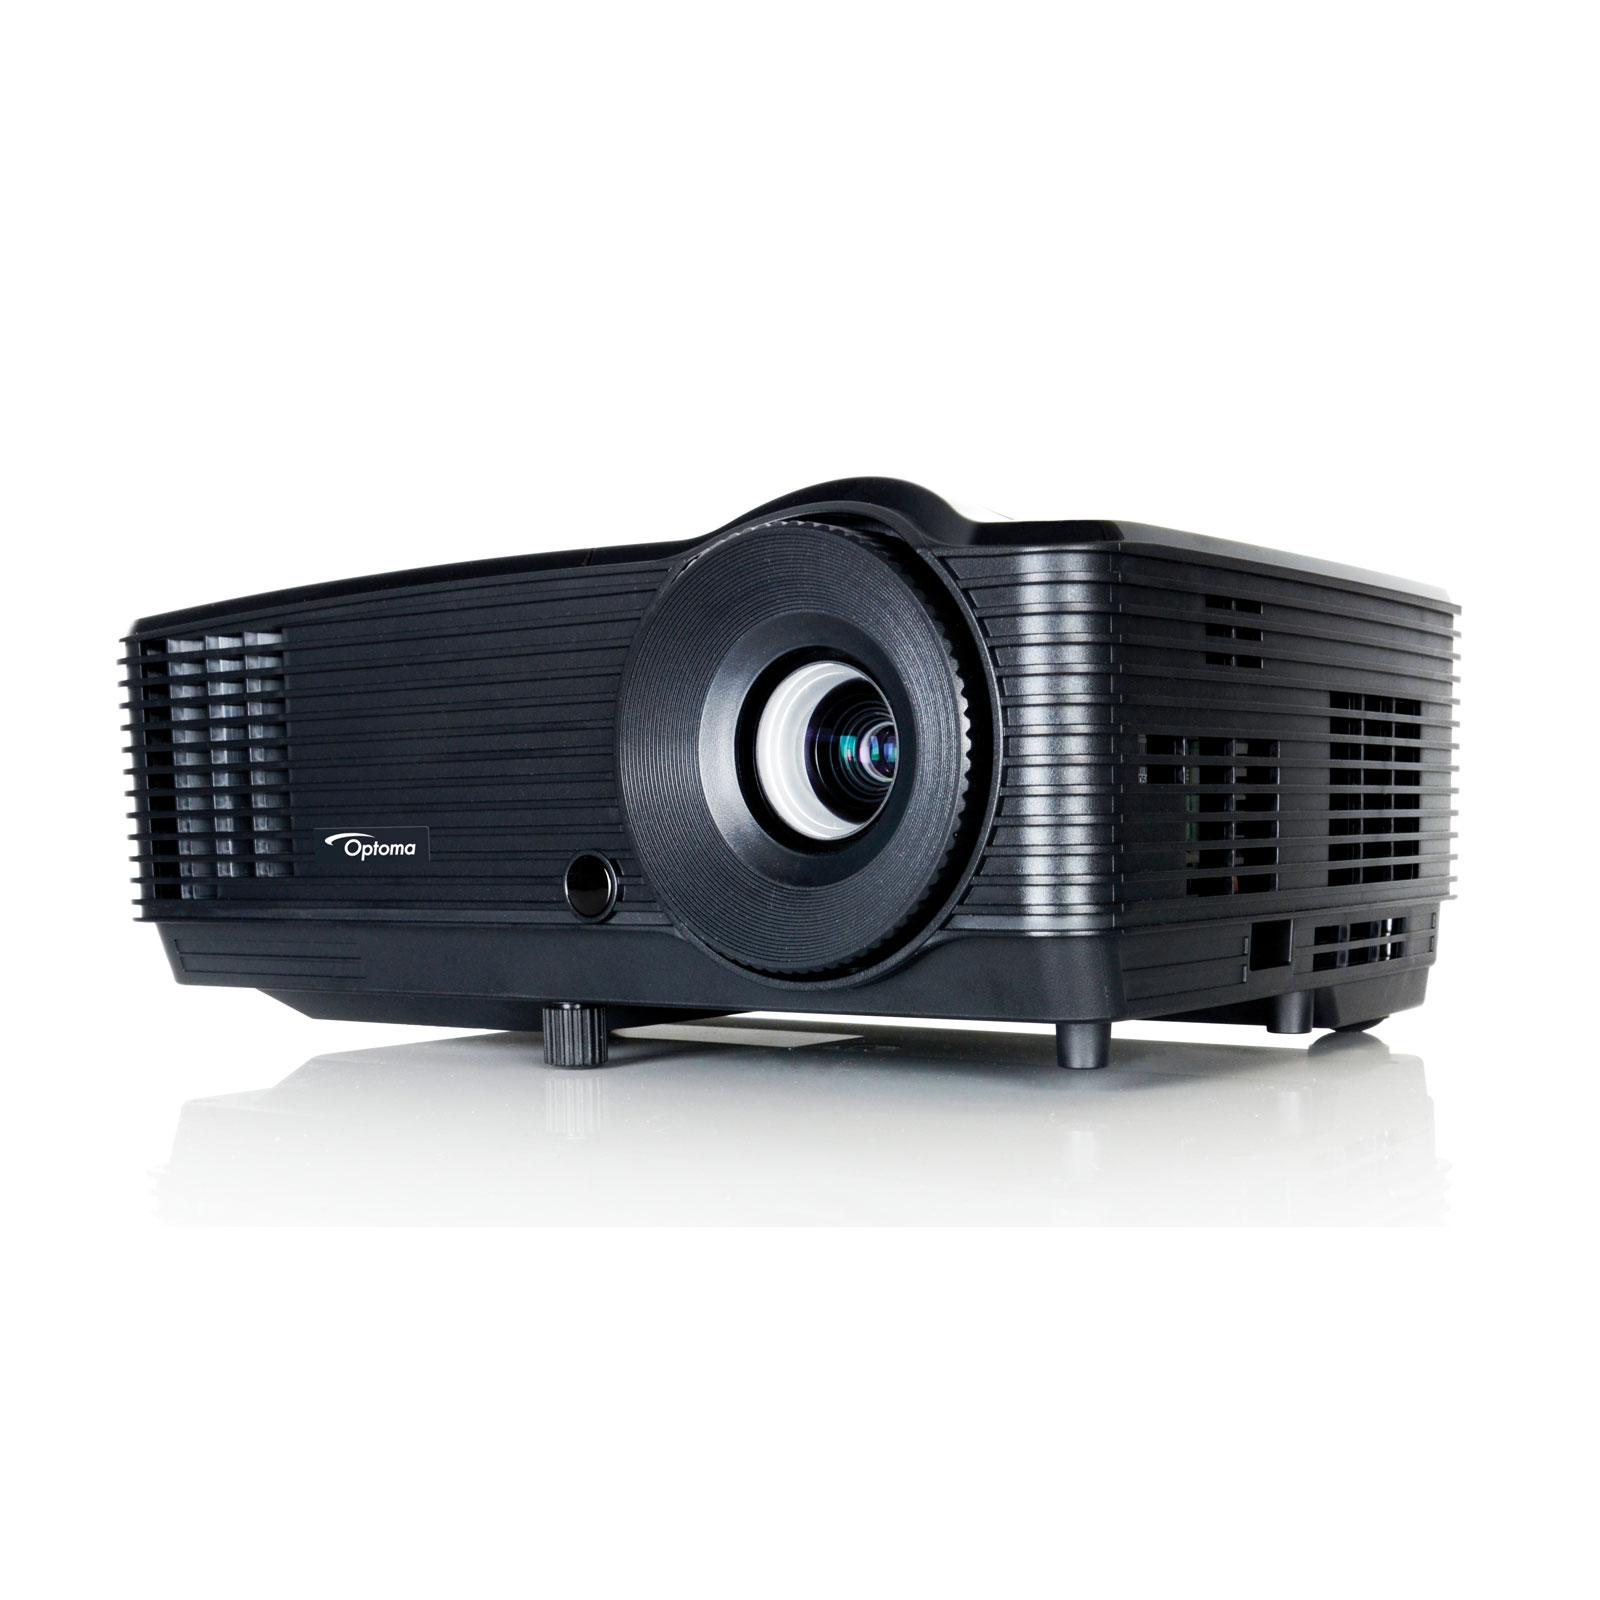 Optoma ds341 e1p1f0j110z1 achat vente for Meuble videoprojecteur